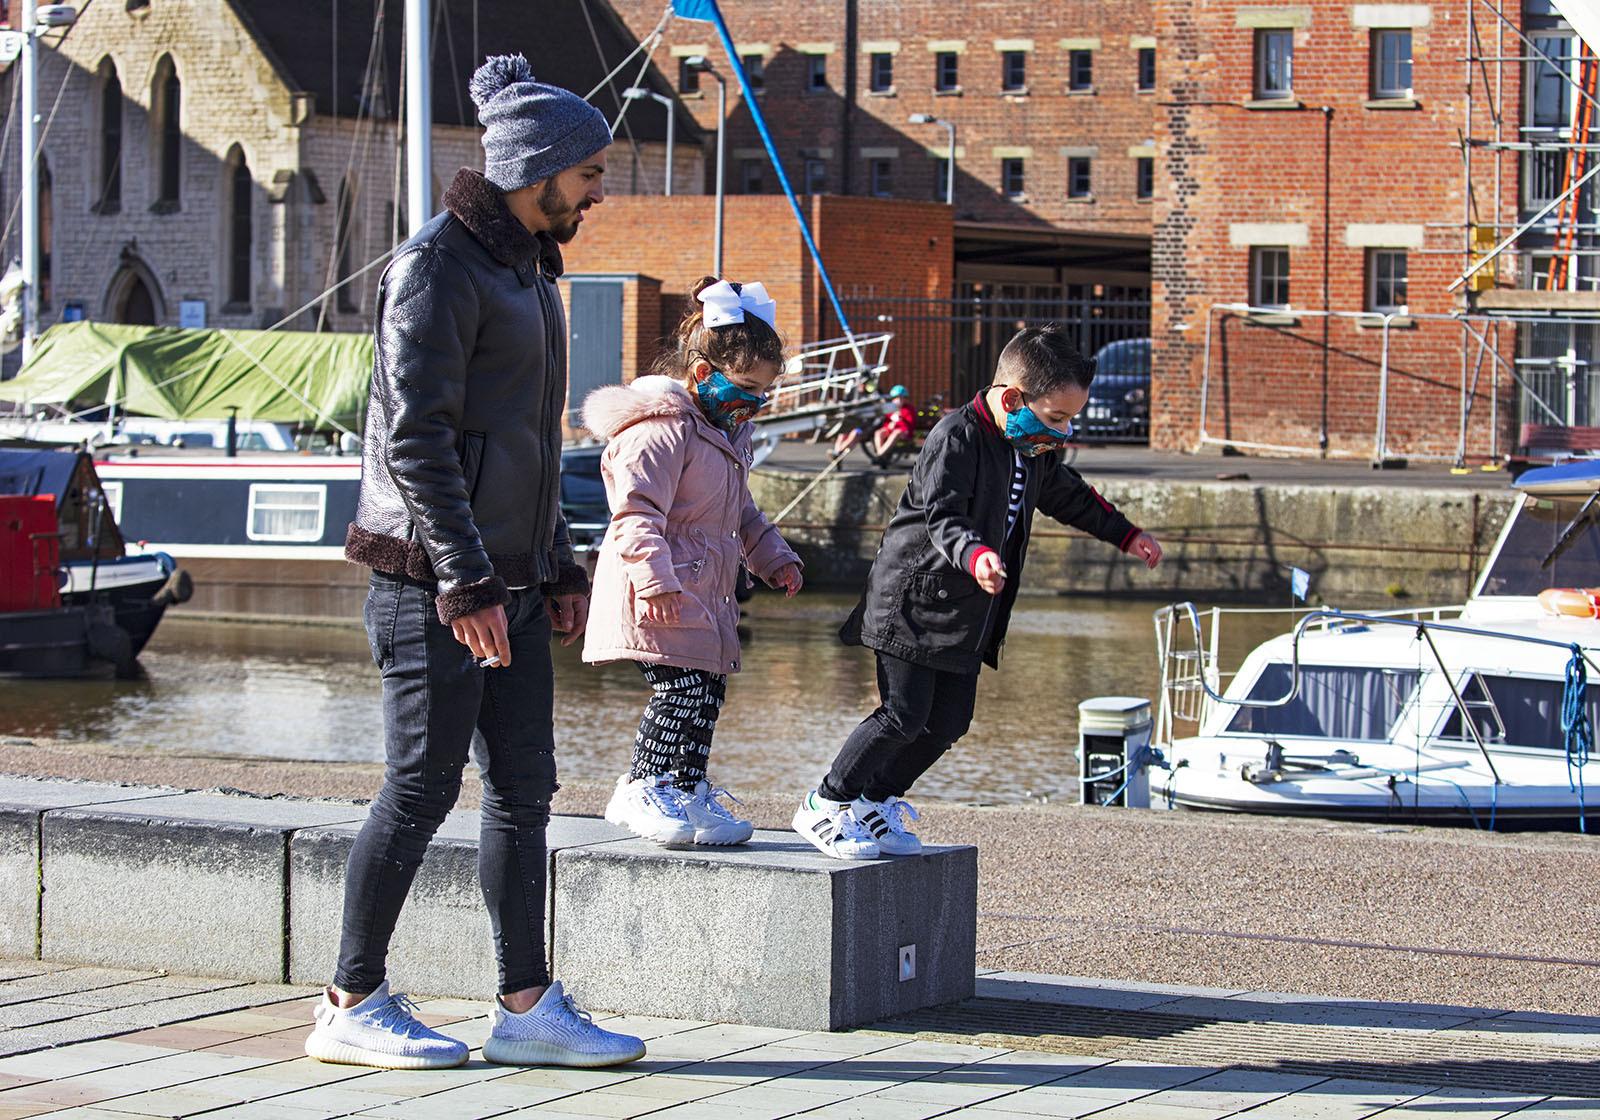 Leap of Faith - Gloucester Docks U.K.